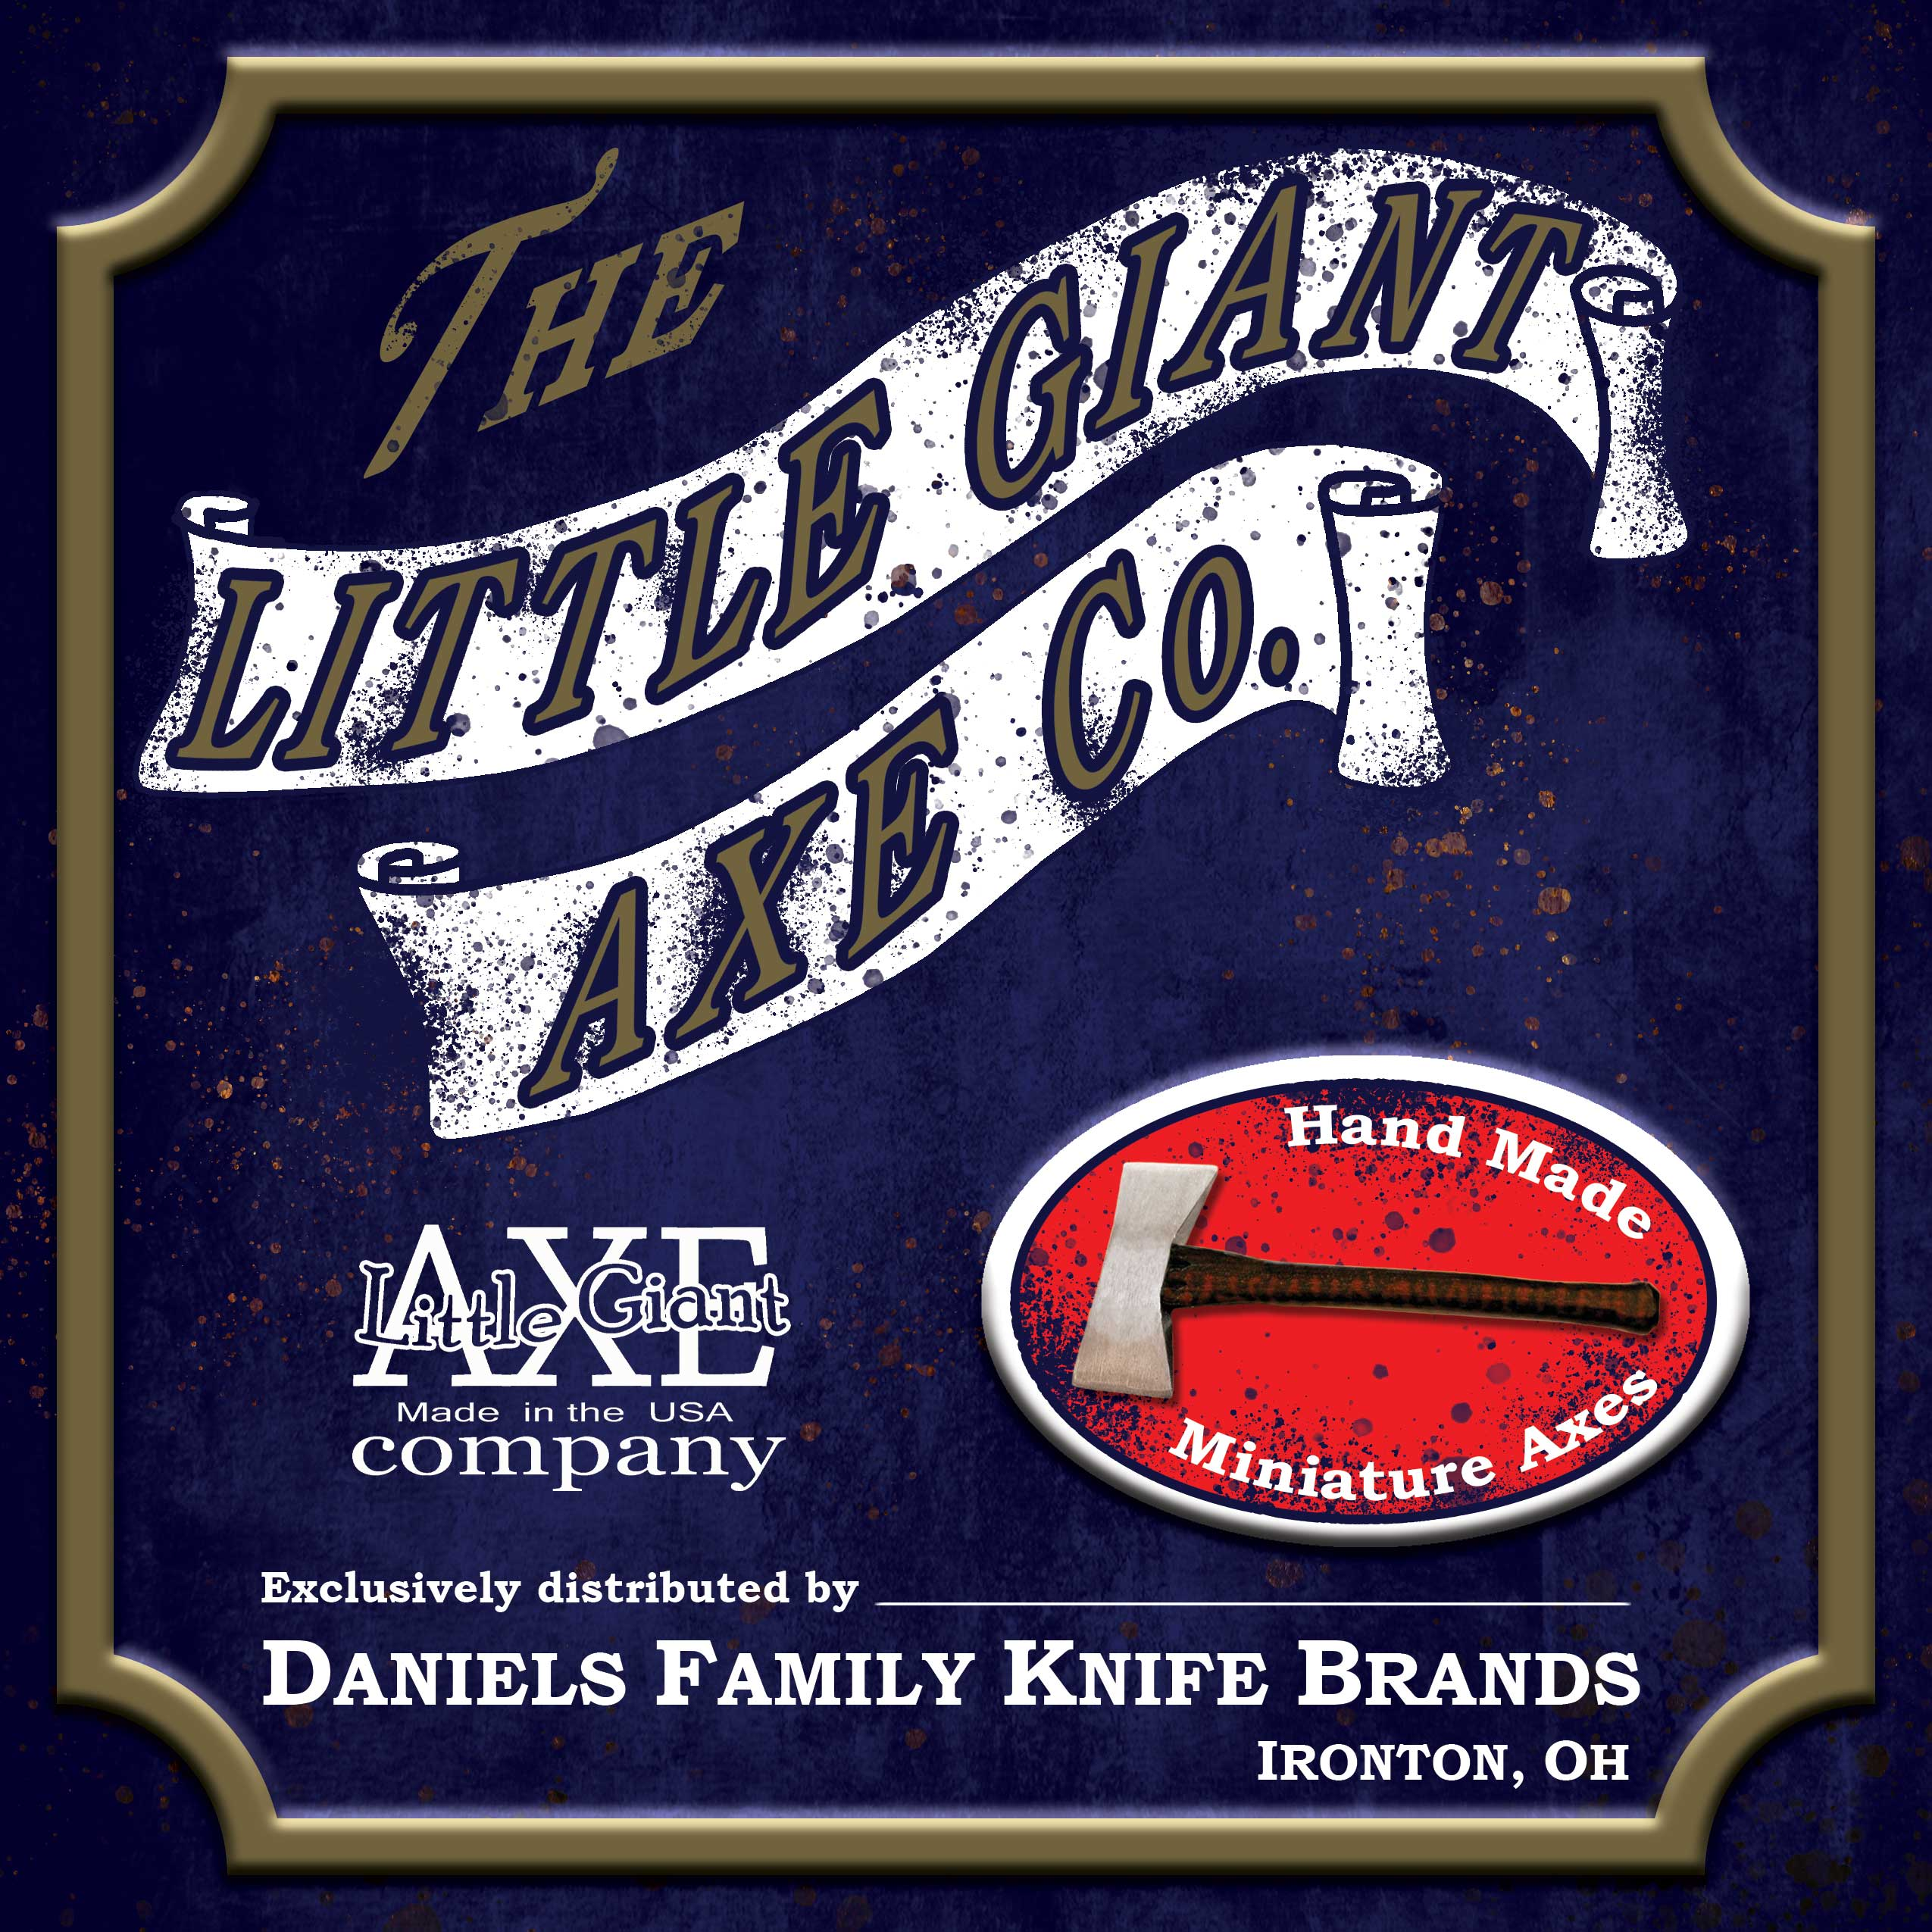 Little Giant Axe Co. logo ad